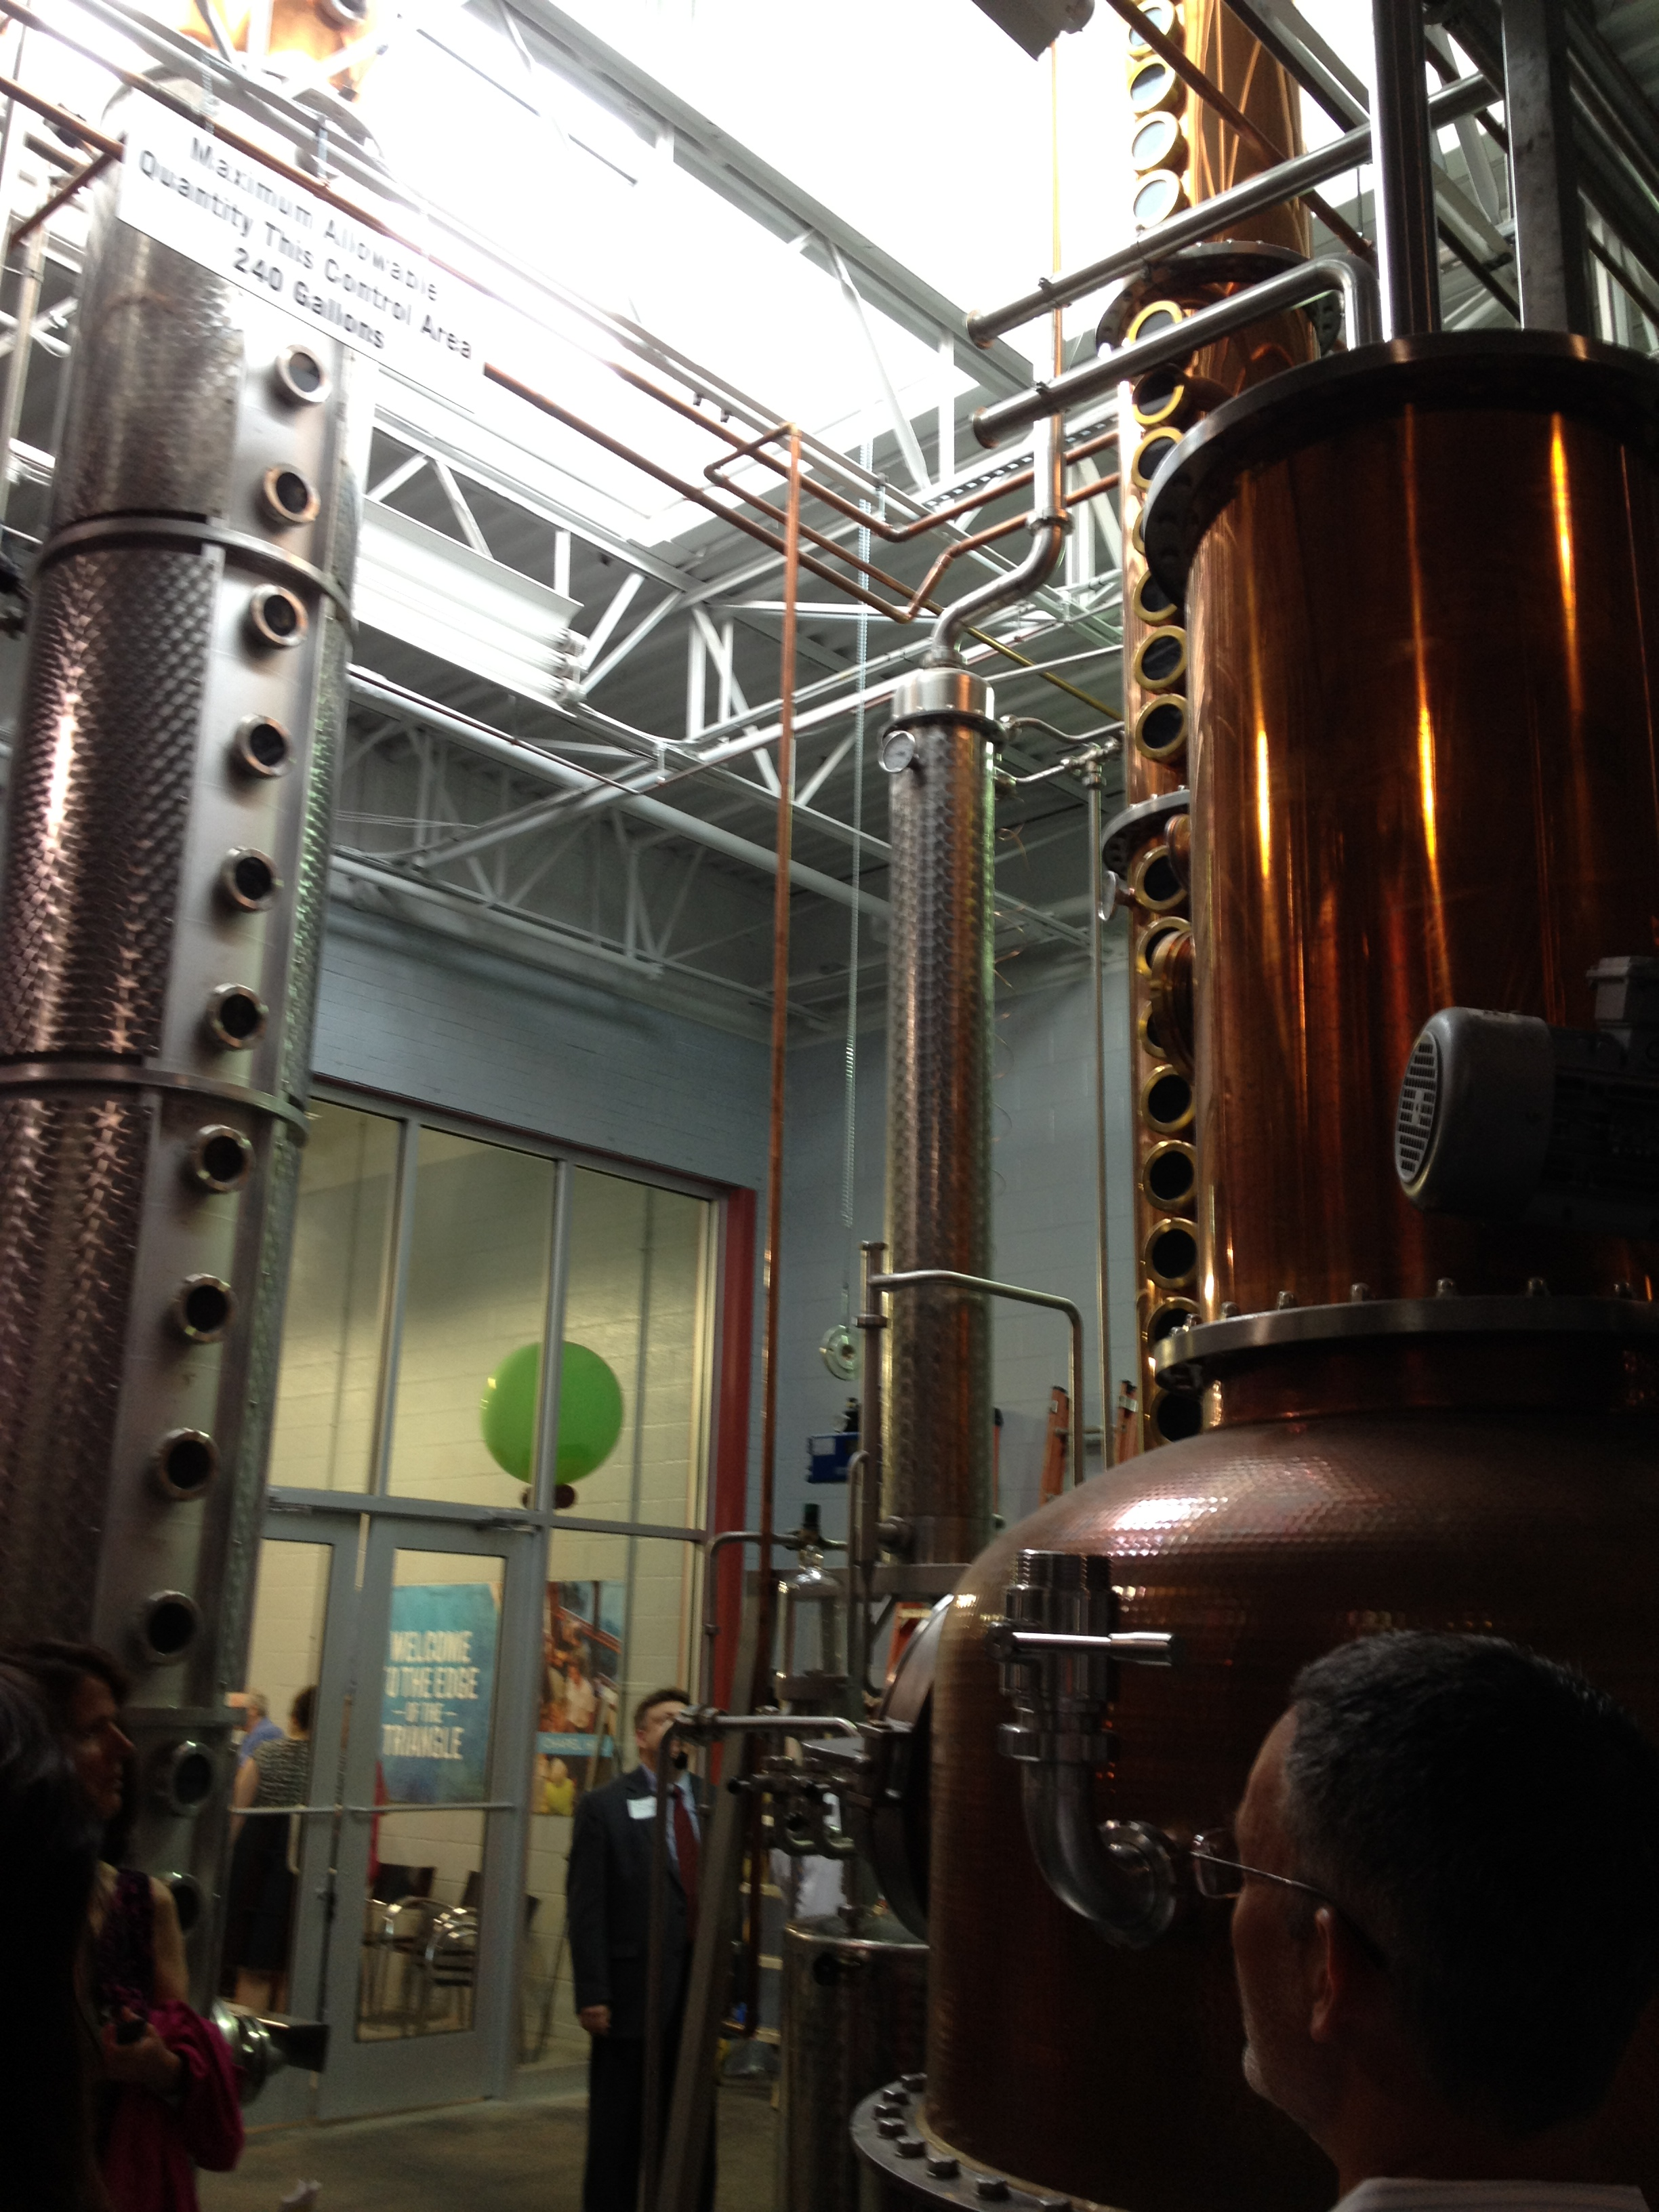 Topo Distillery begins manufacturing local organic liquor on Franklin Street